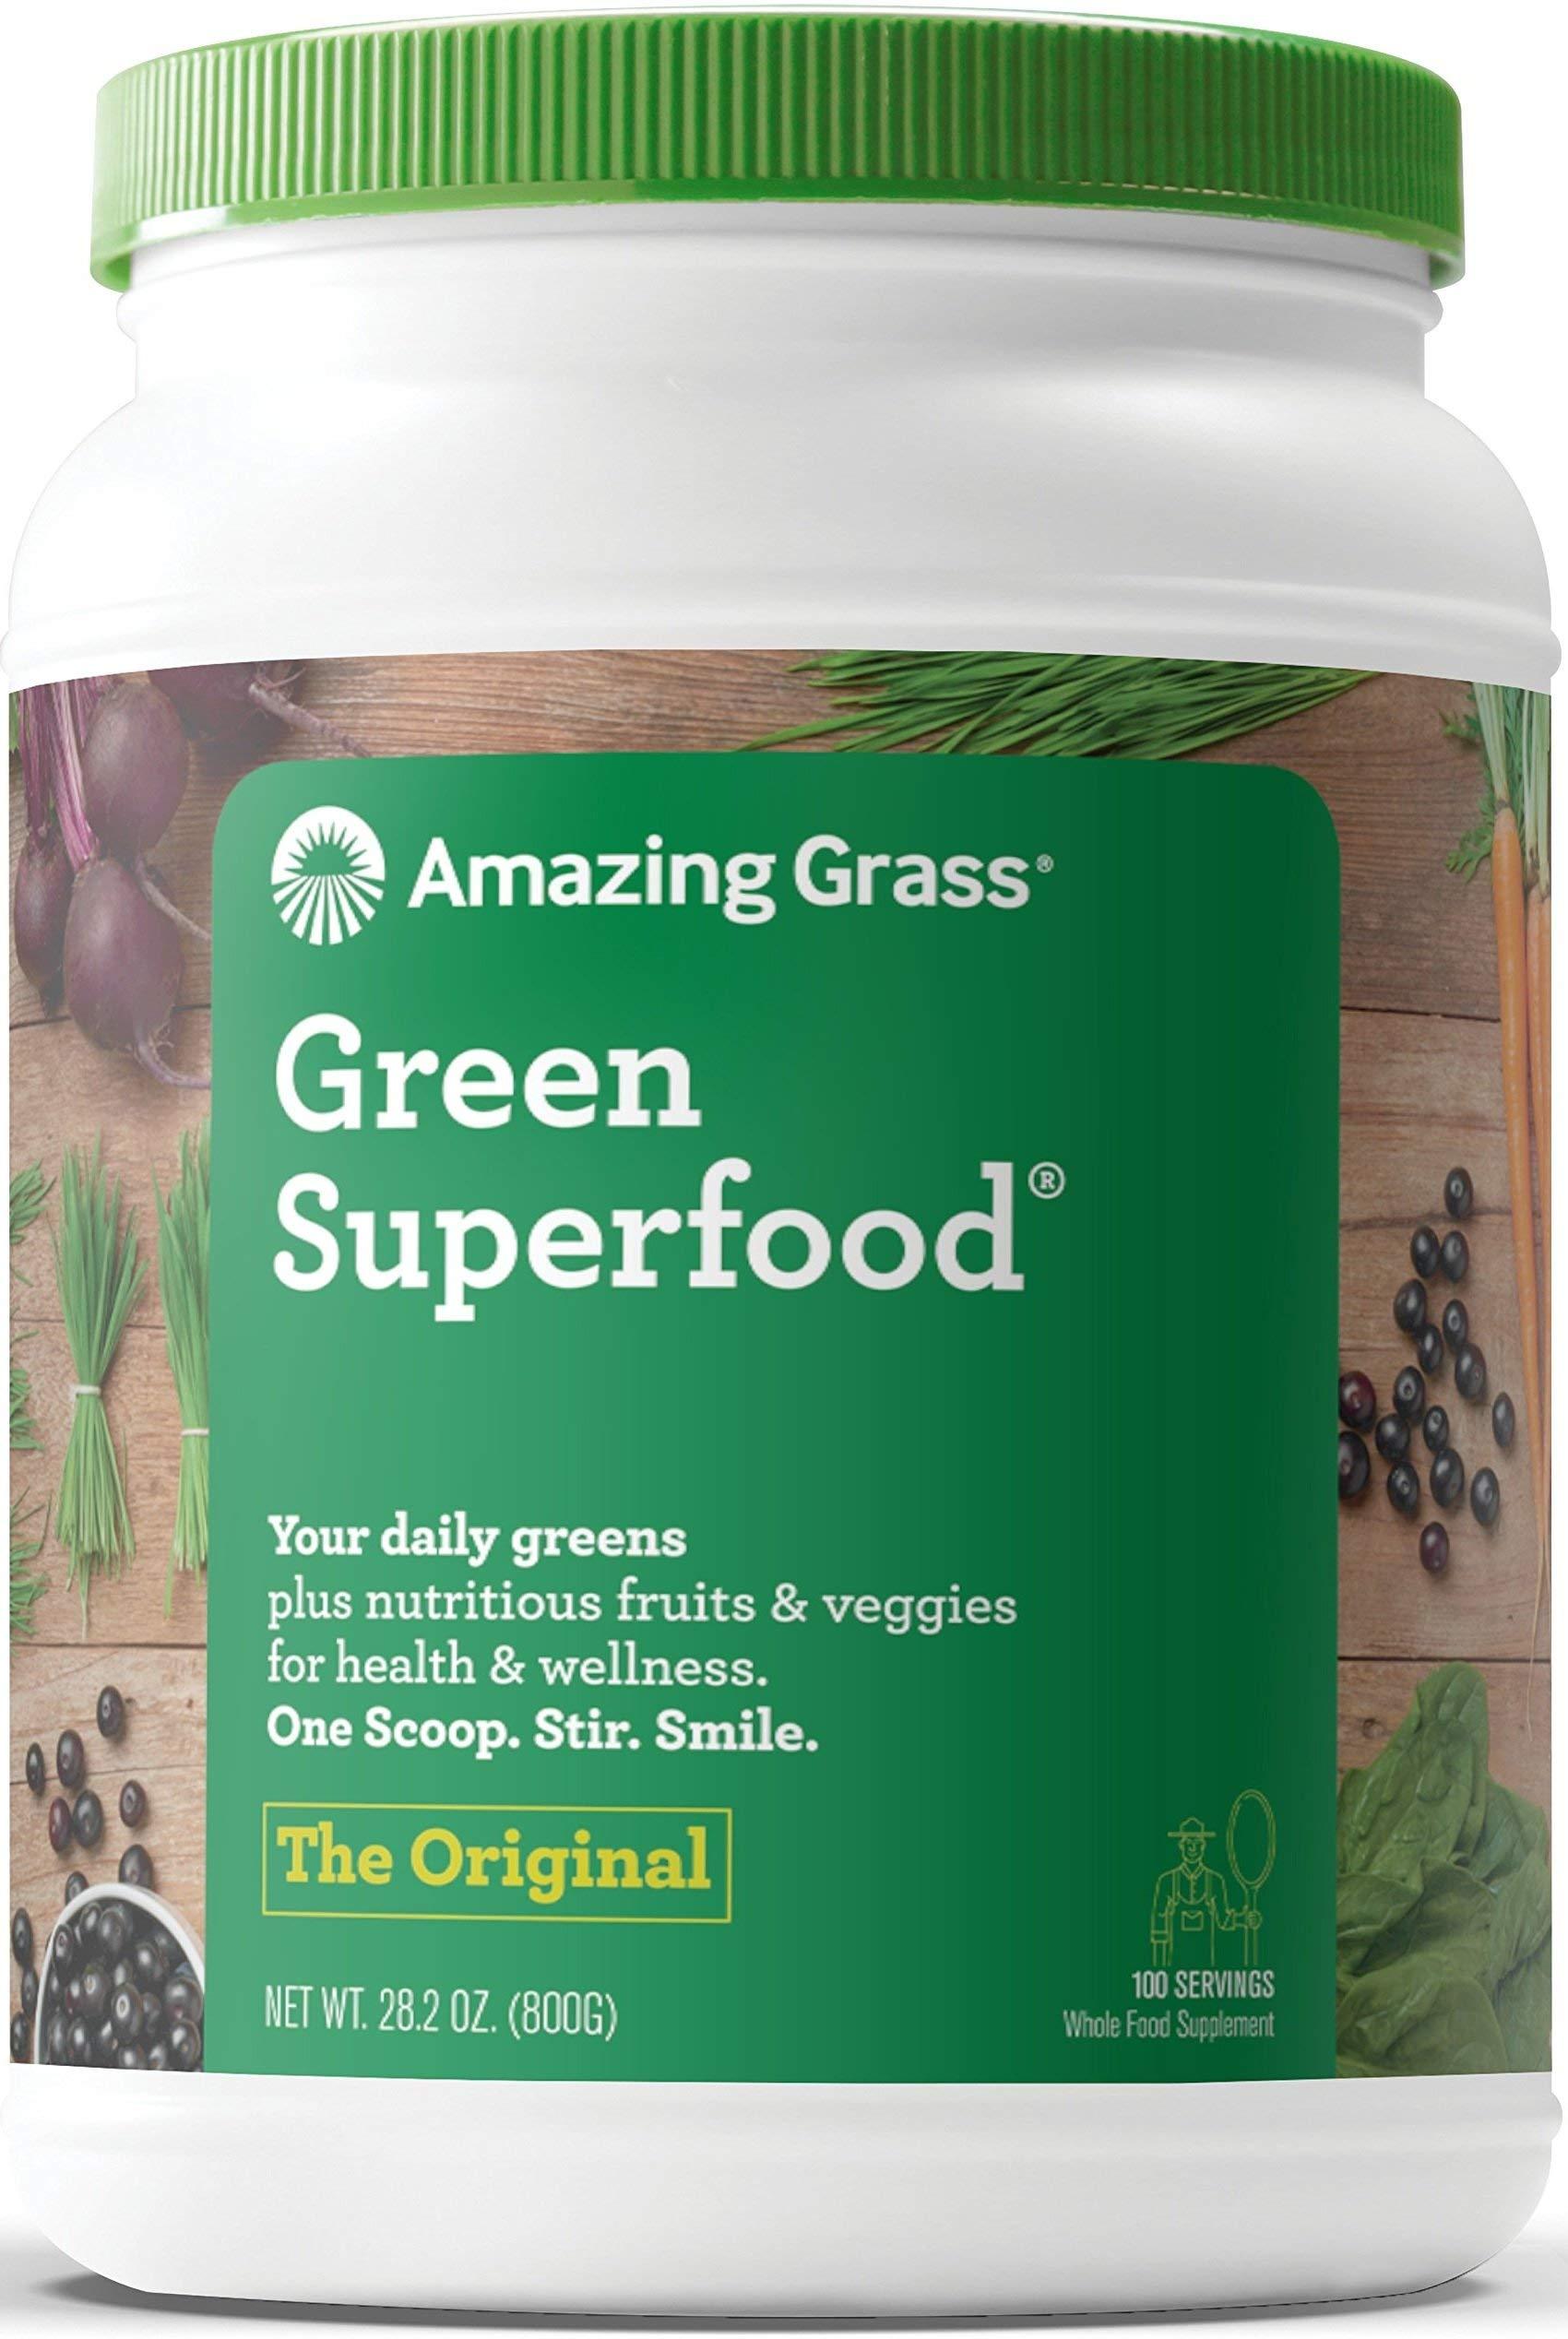 Amazing Grass Original Green SuperFood - 100 Servings-28 oz